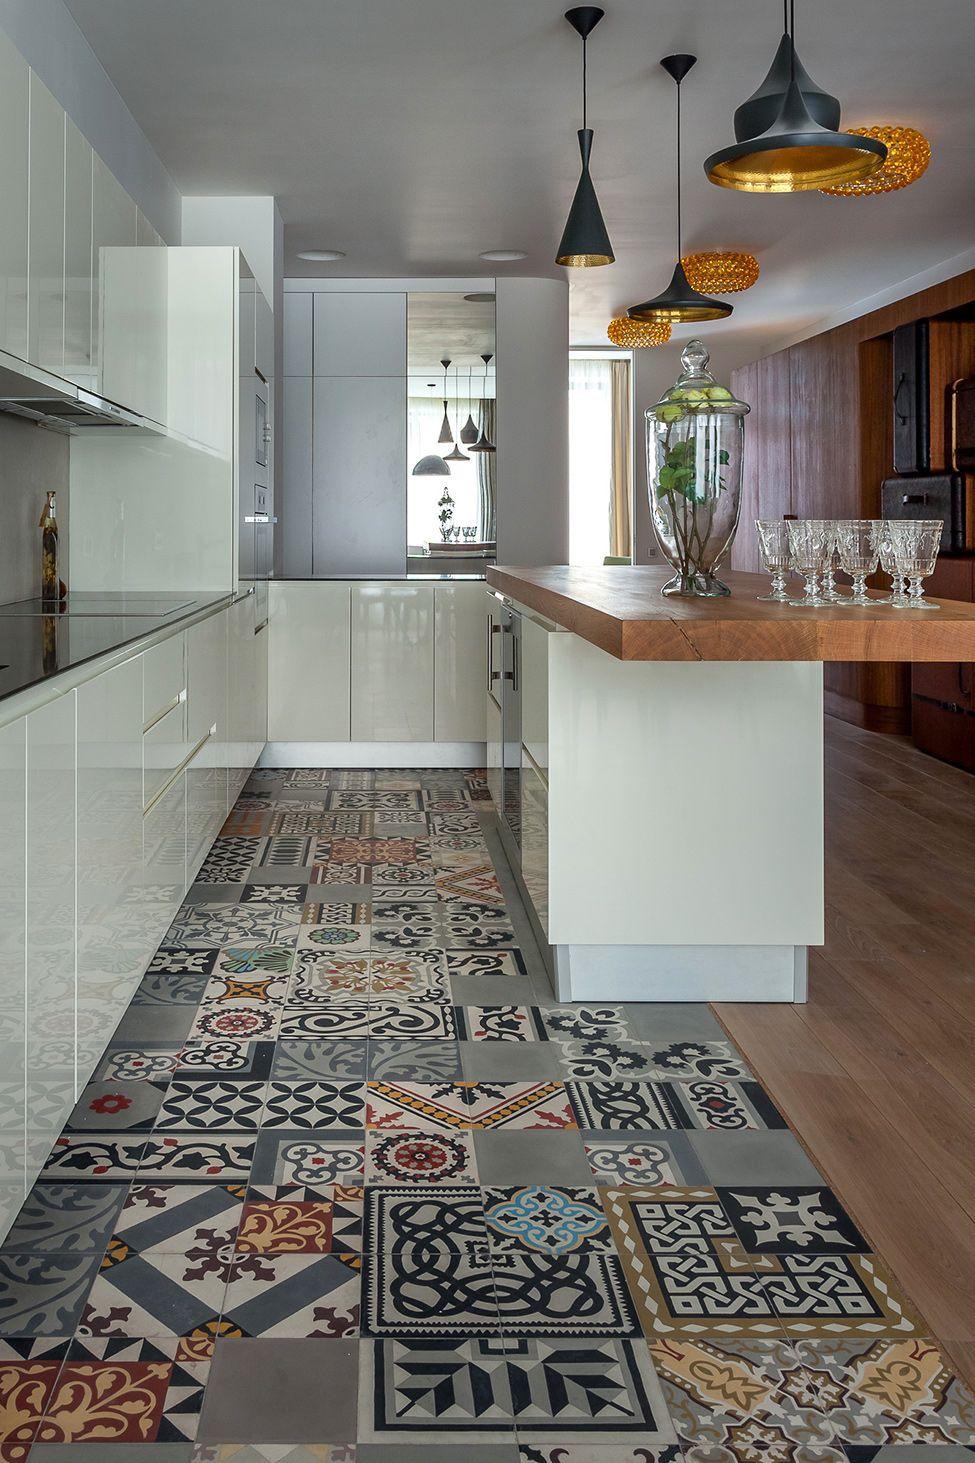 Mosaic Floors Mosaics And Kitchens